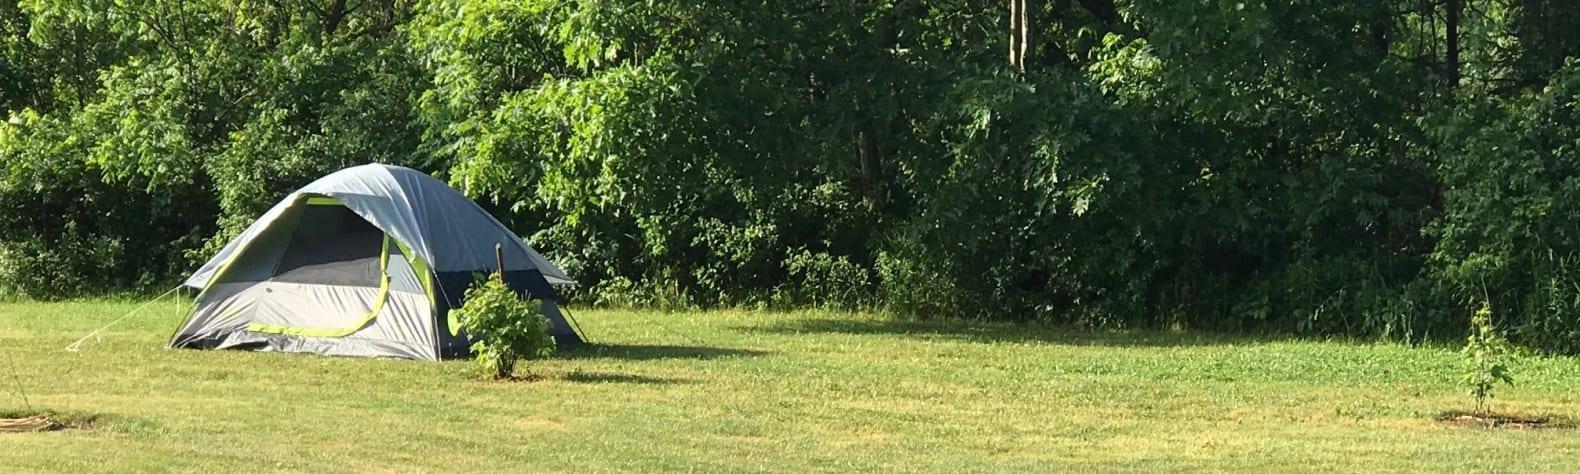 Fitz Farm Manor Camping